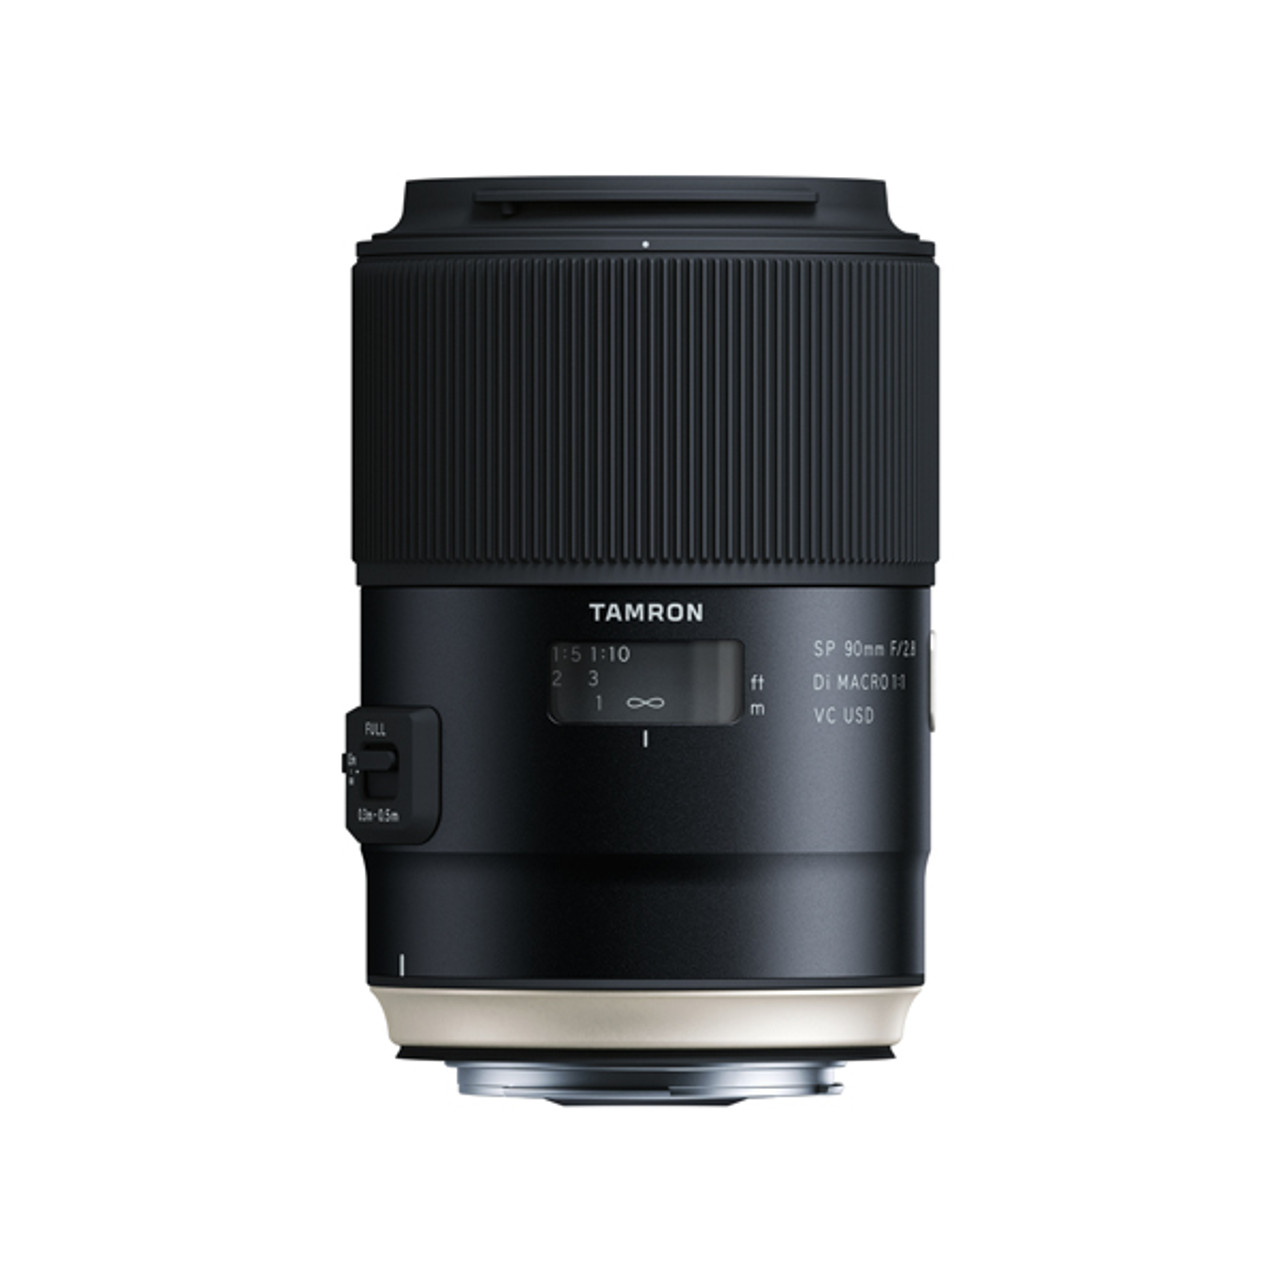 Tamron 90mm F2.8 Di VC USD R2 Nikon